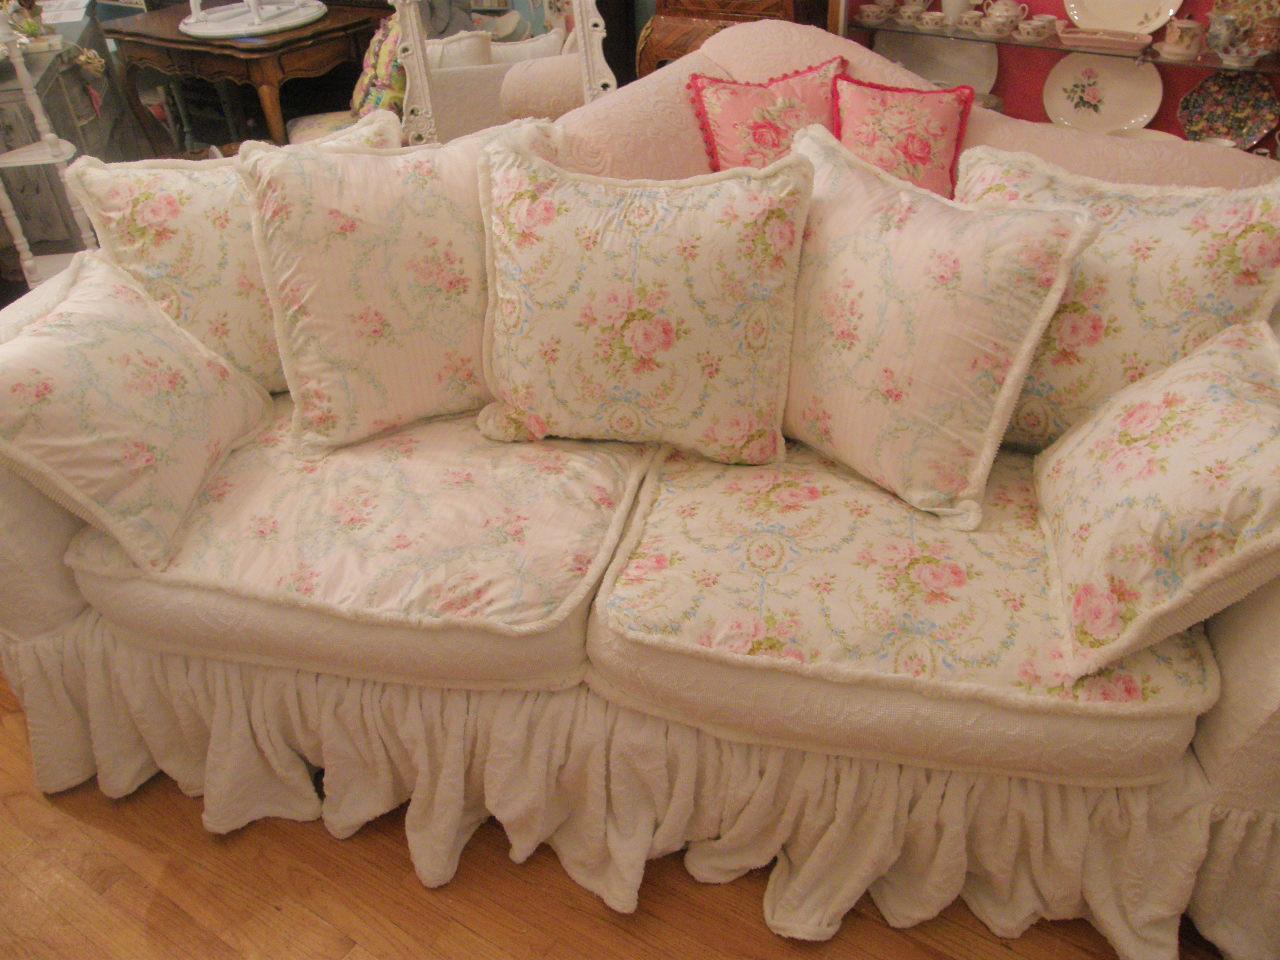 Vintage Chic Furniture Schenectady NY: Shabby Chic